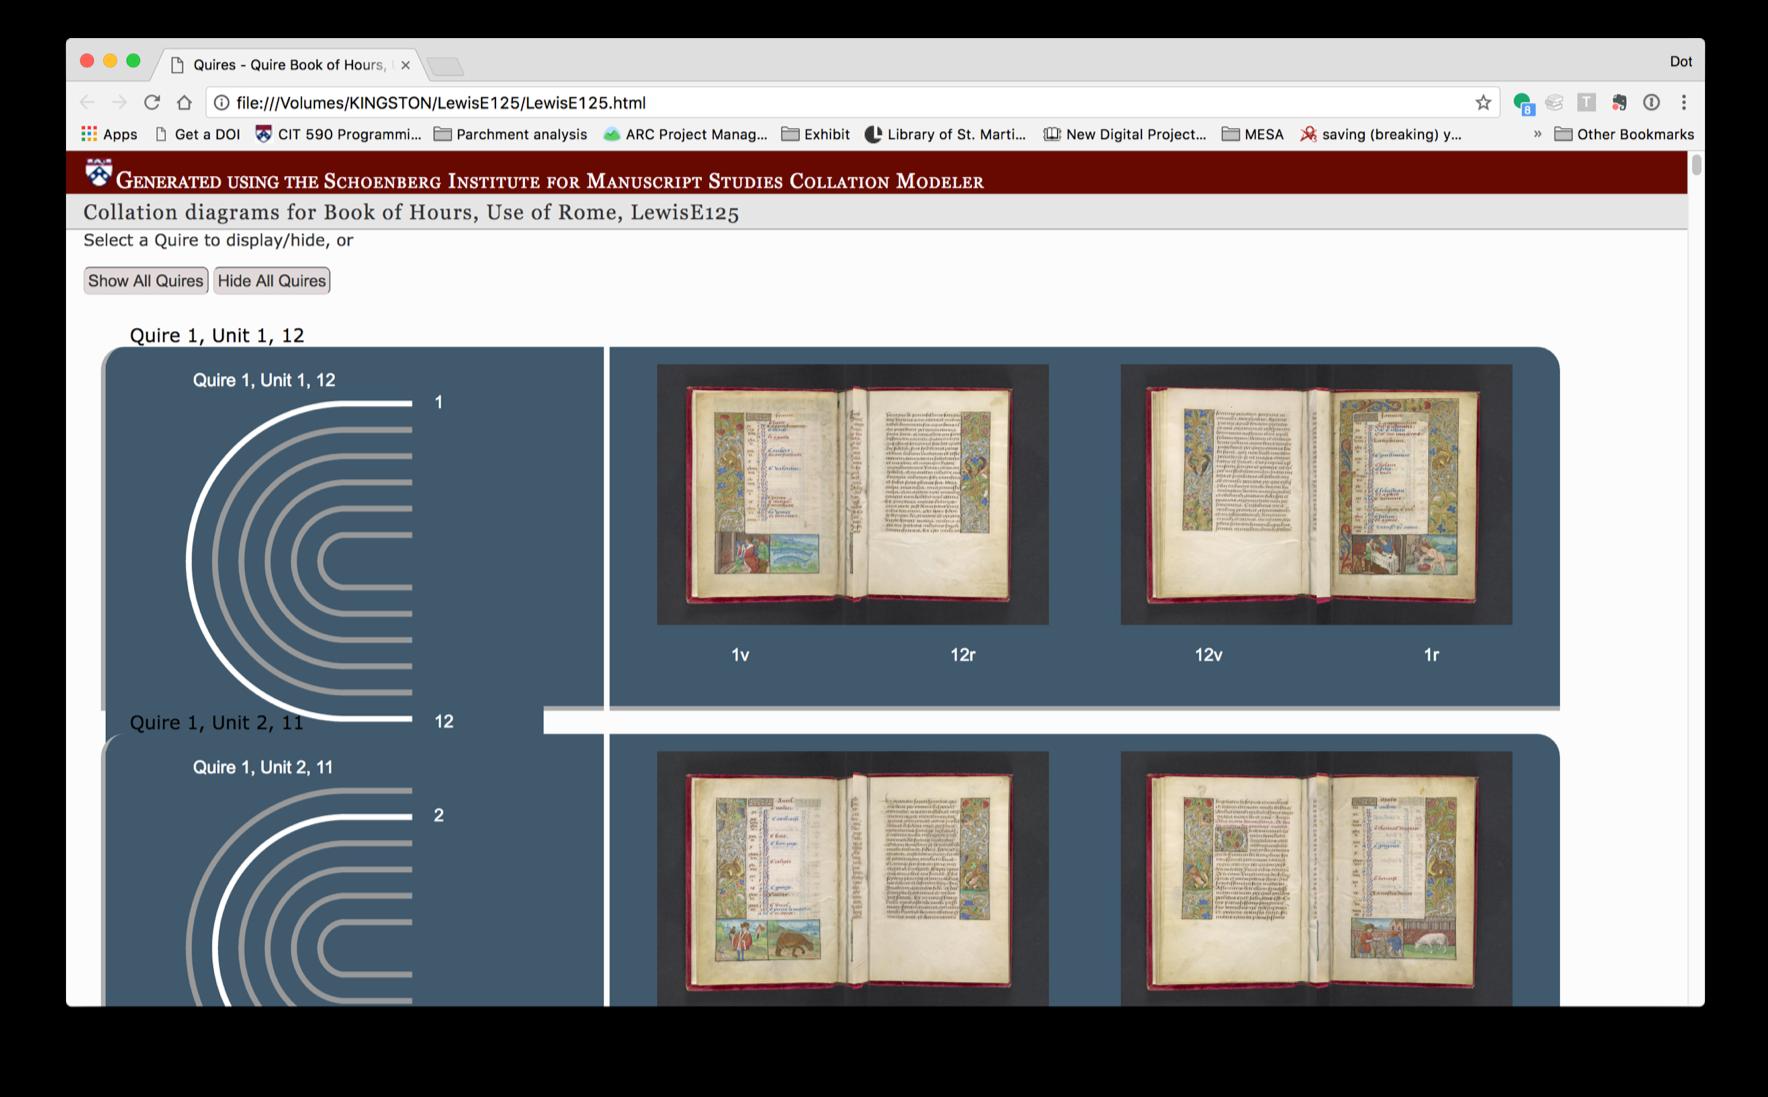 Uncategorized Archives - Dot Porter Digital